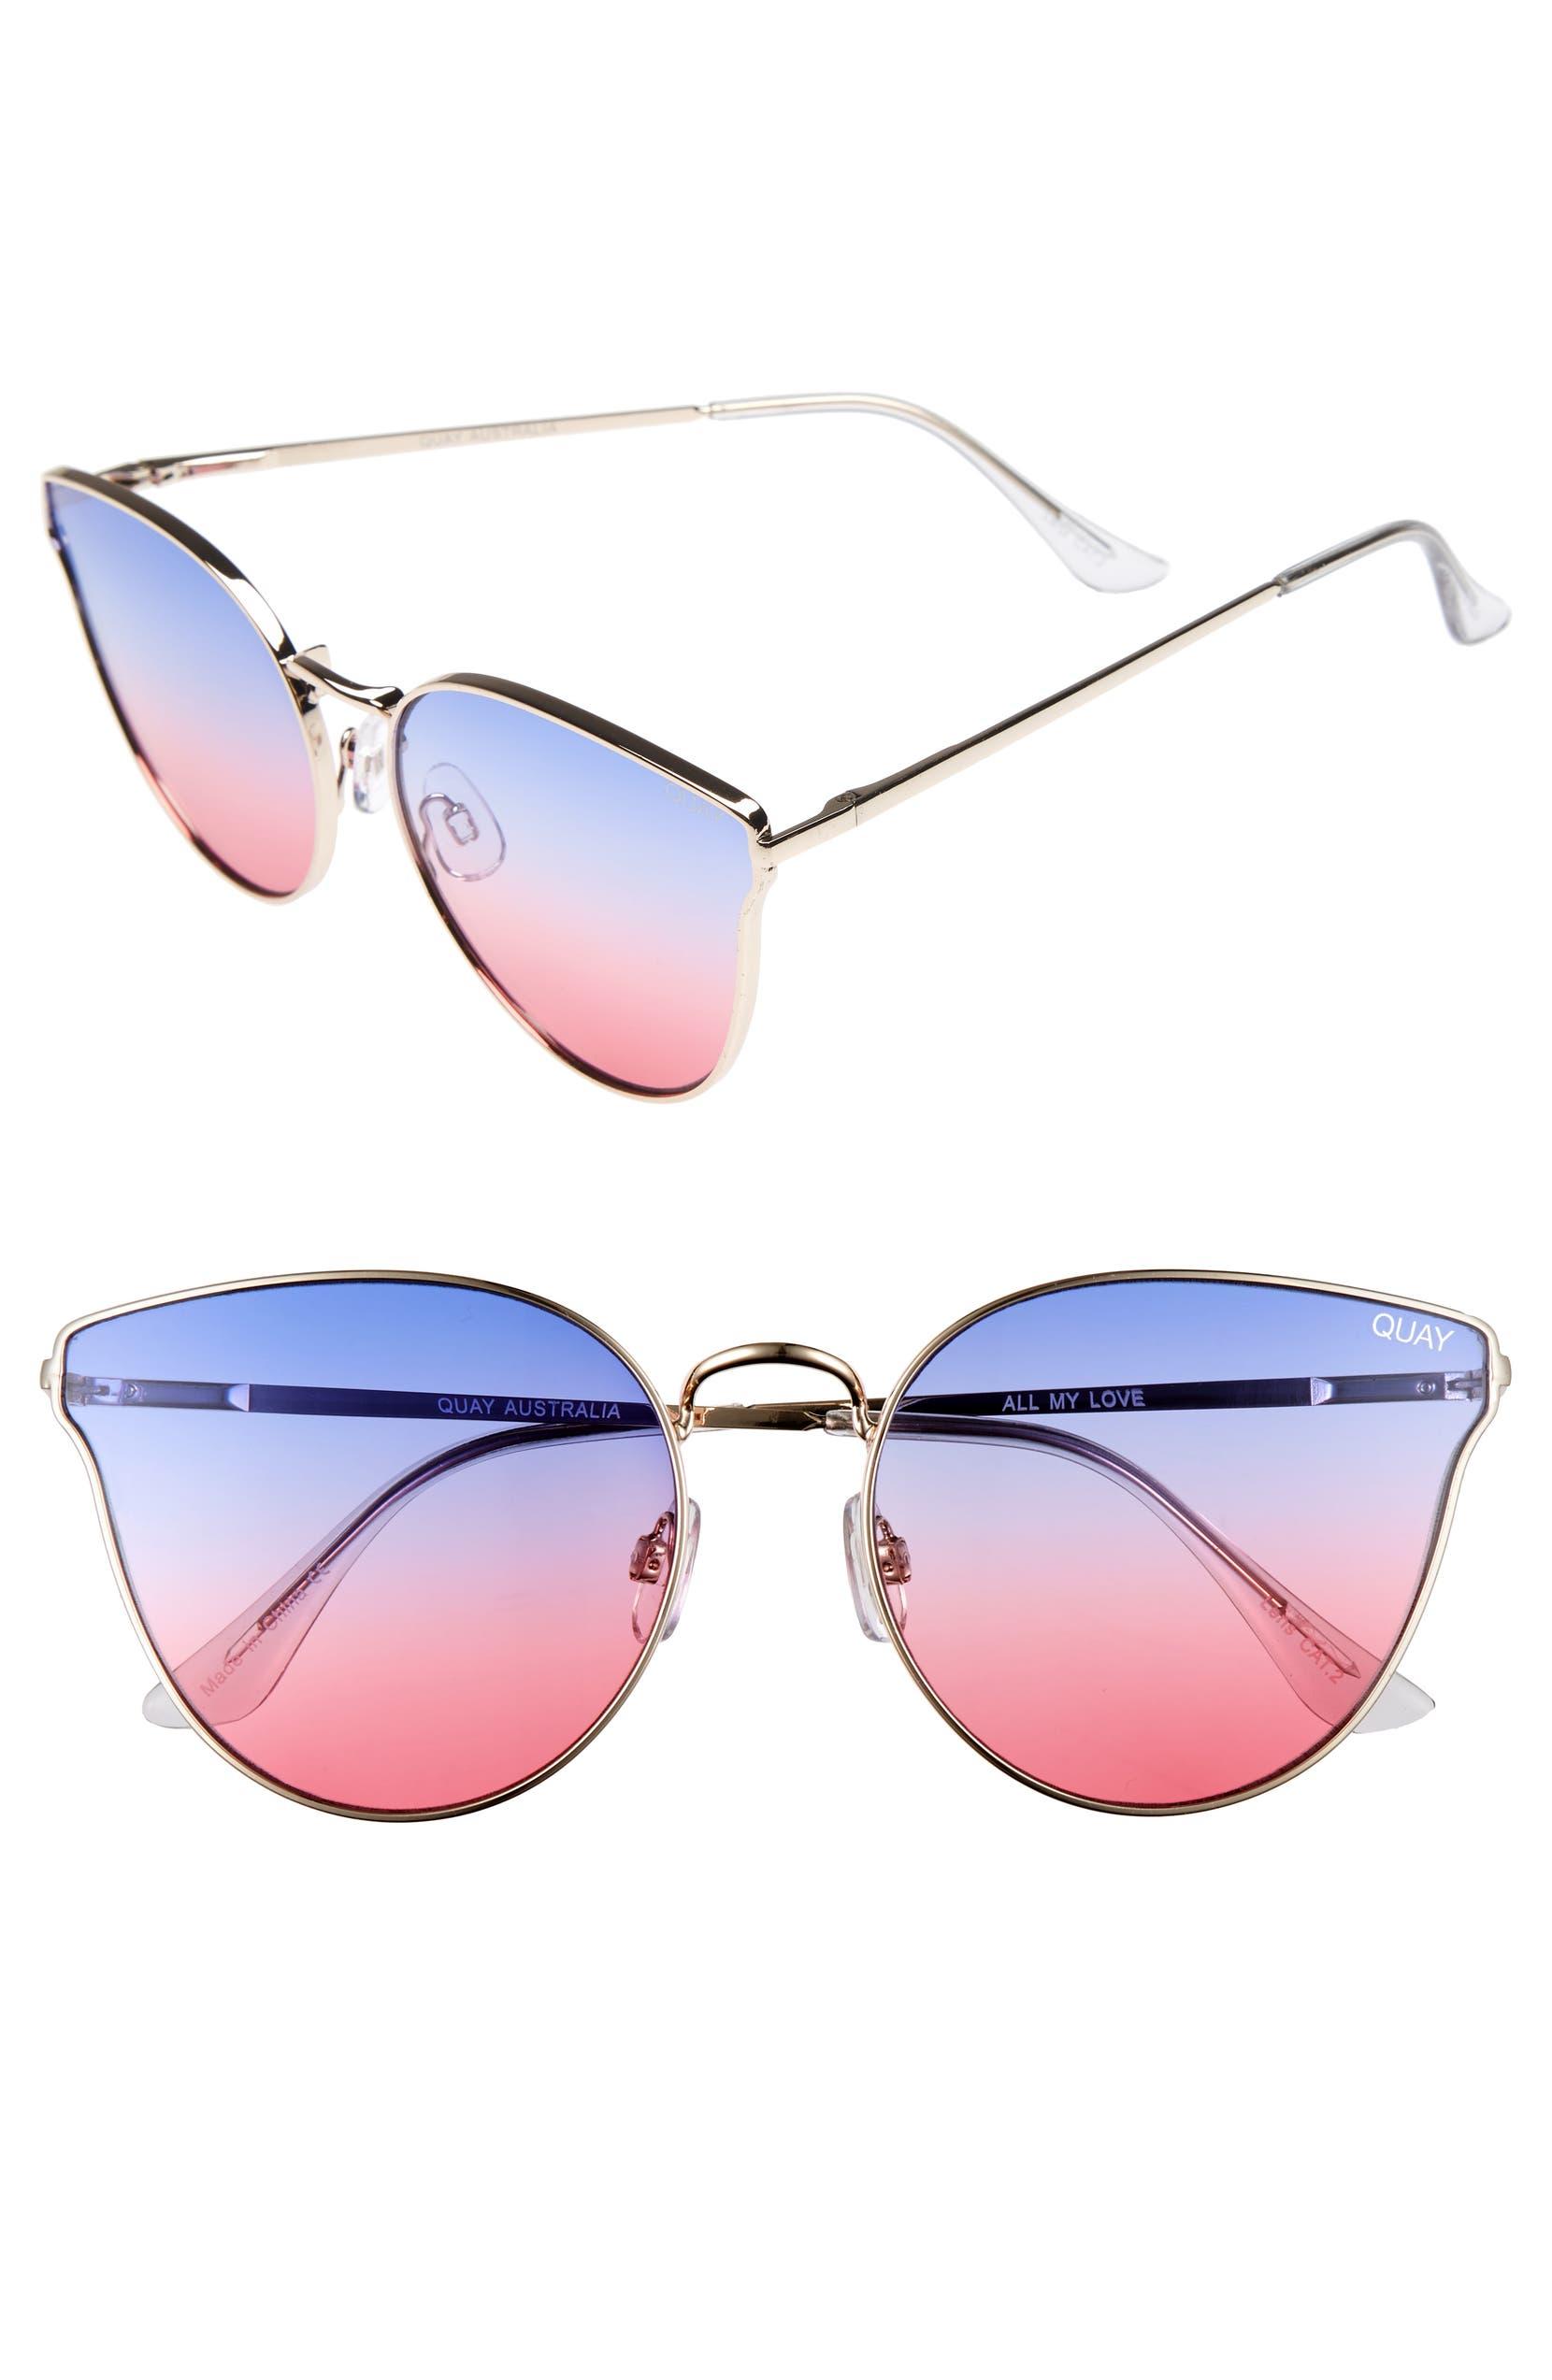 bfd3546b37 Quay Australia  All My Love  60mm Retro Sunglasses